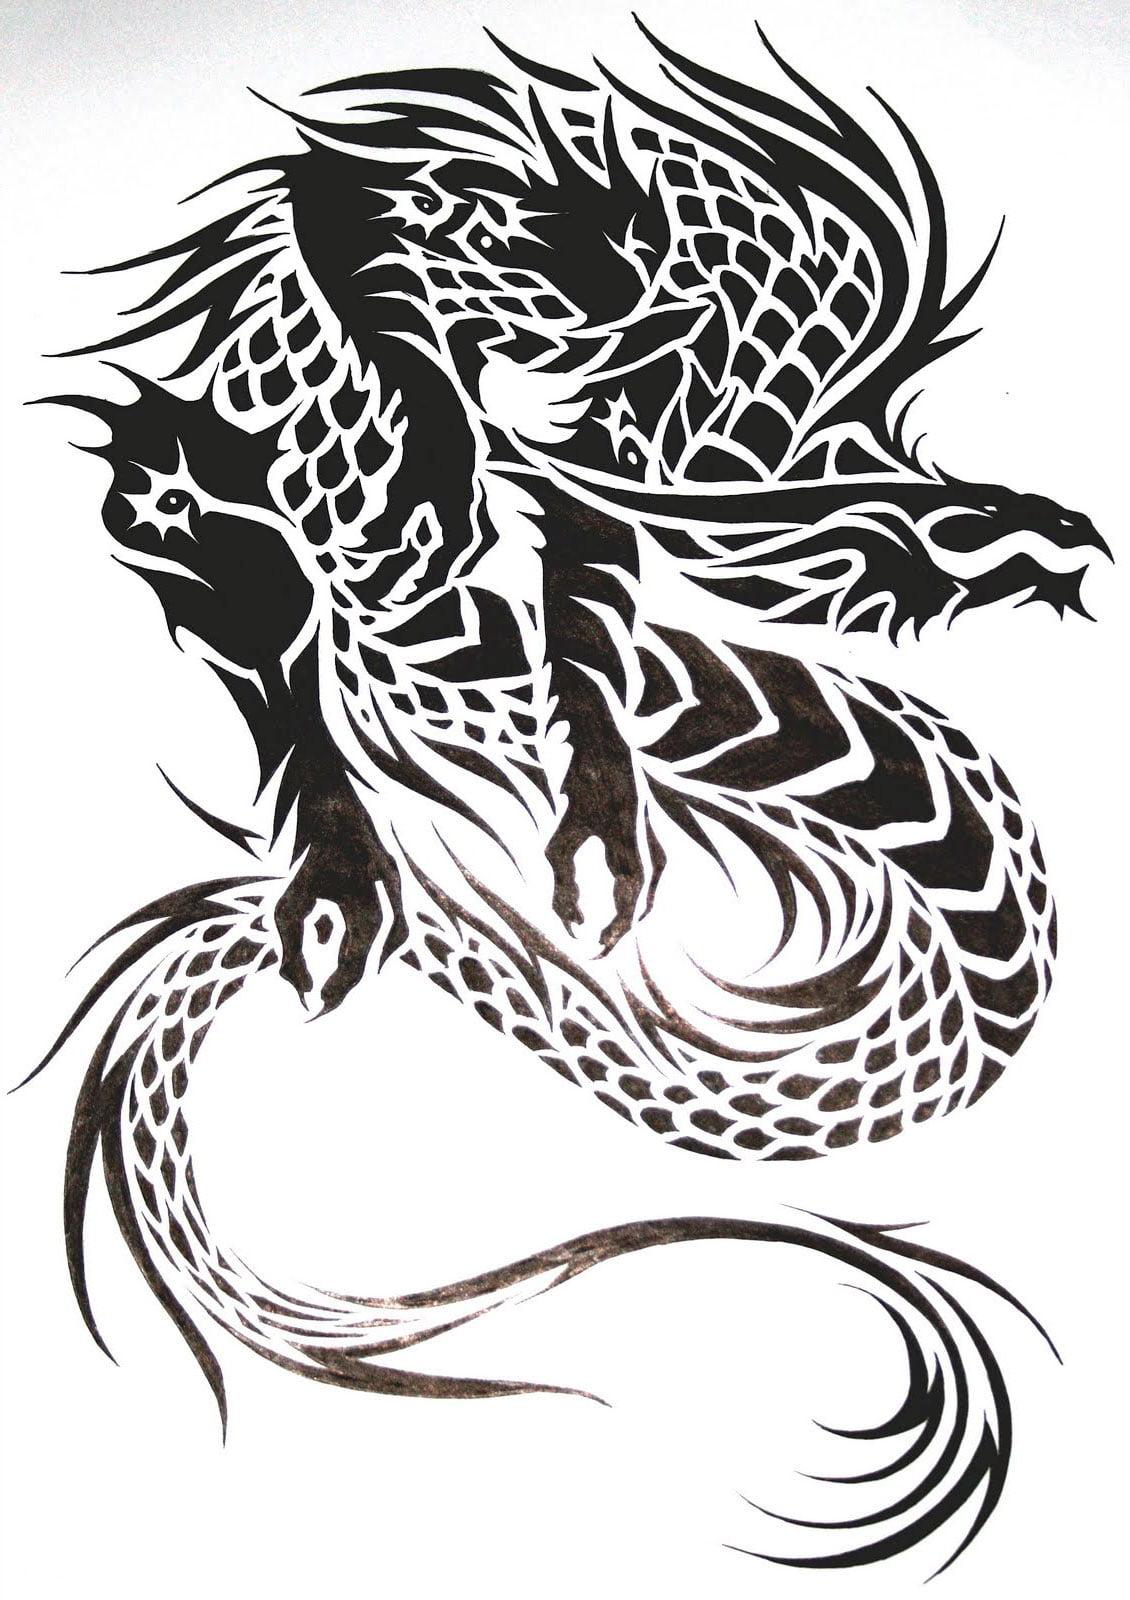 tribal dragon tattoo design cool tattoos bonbaden. Black Bedroom Furniture Sets. Home Design Ideas